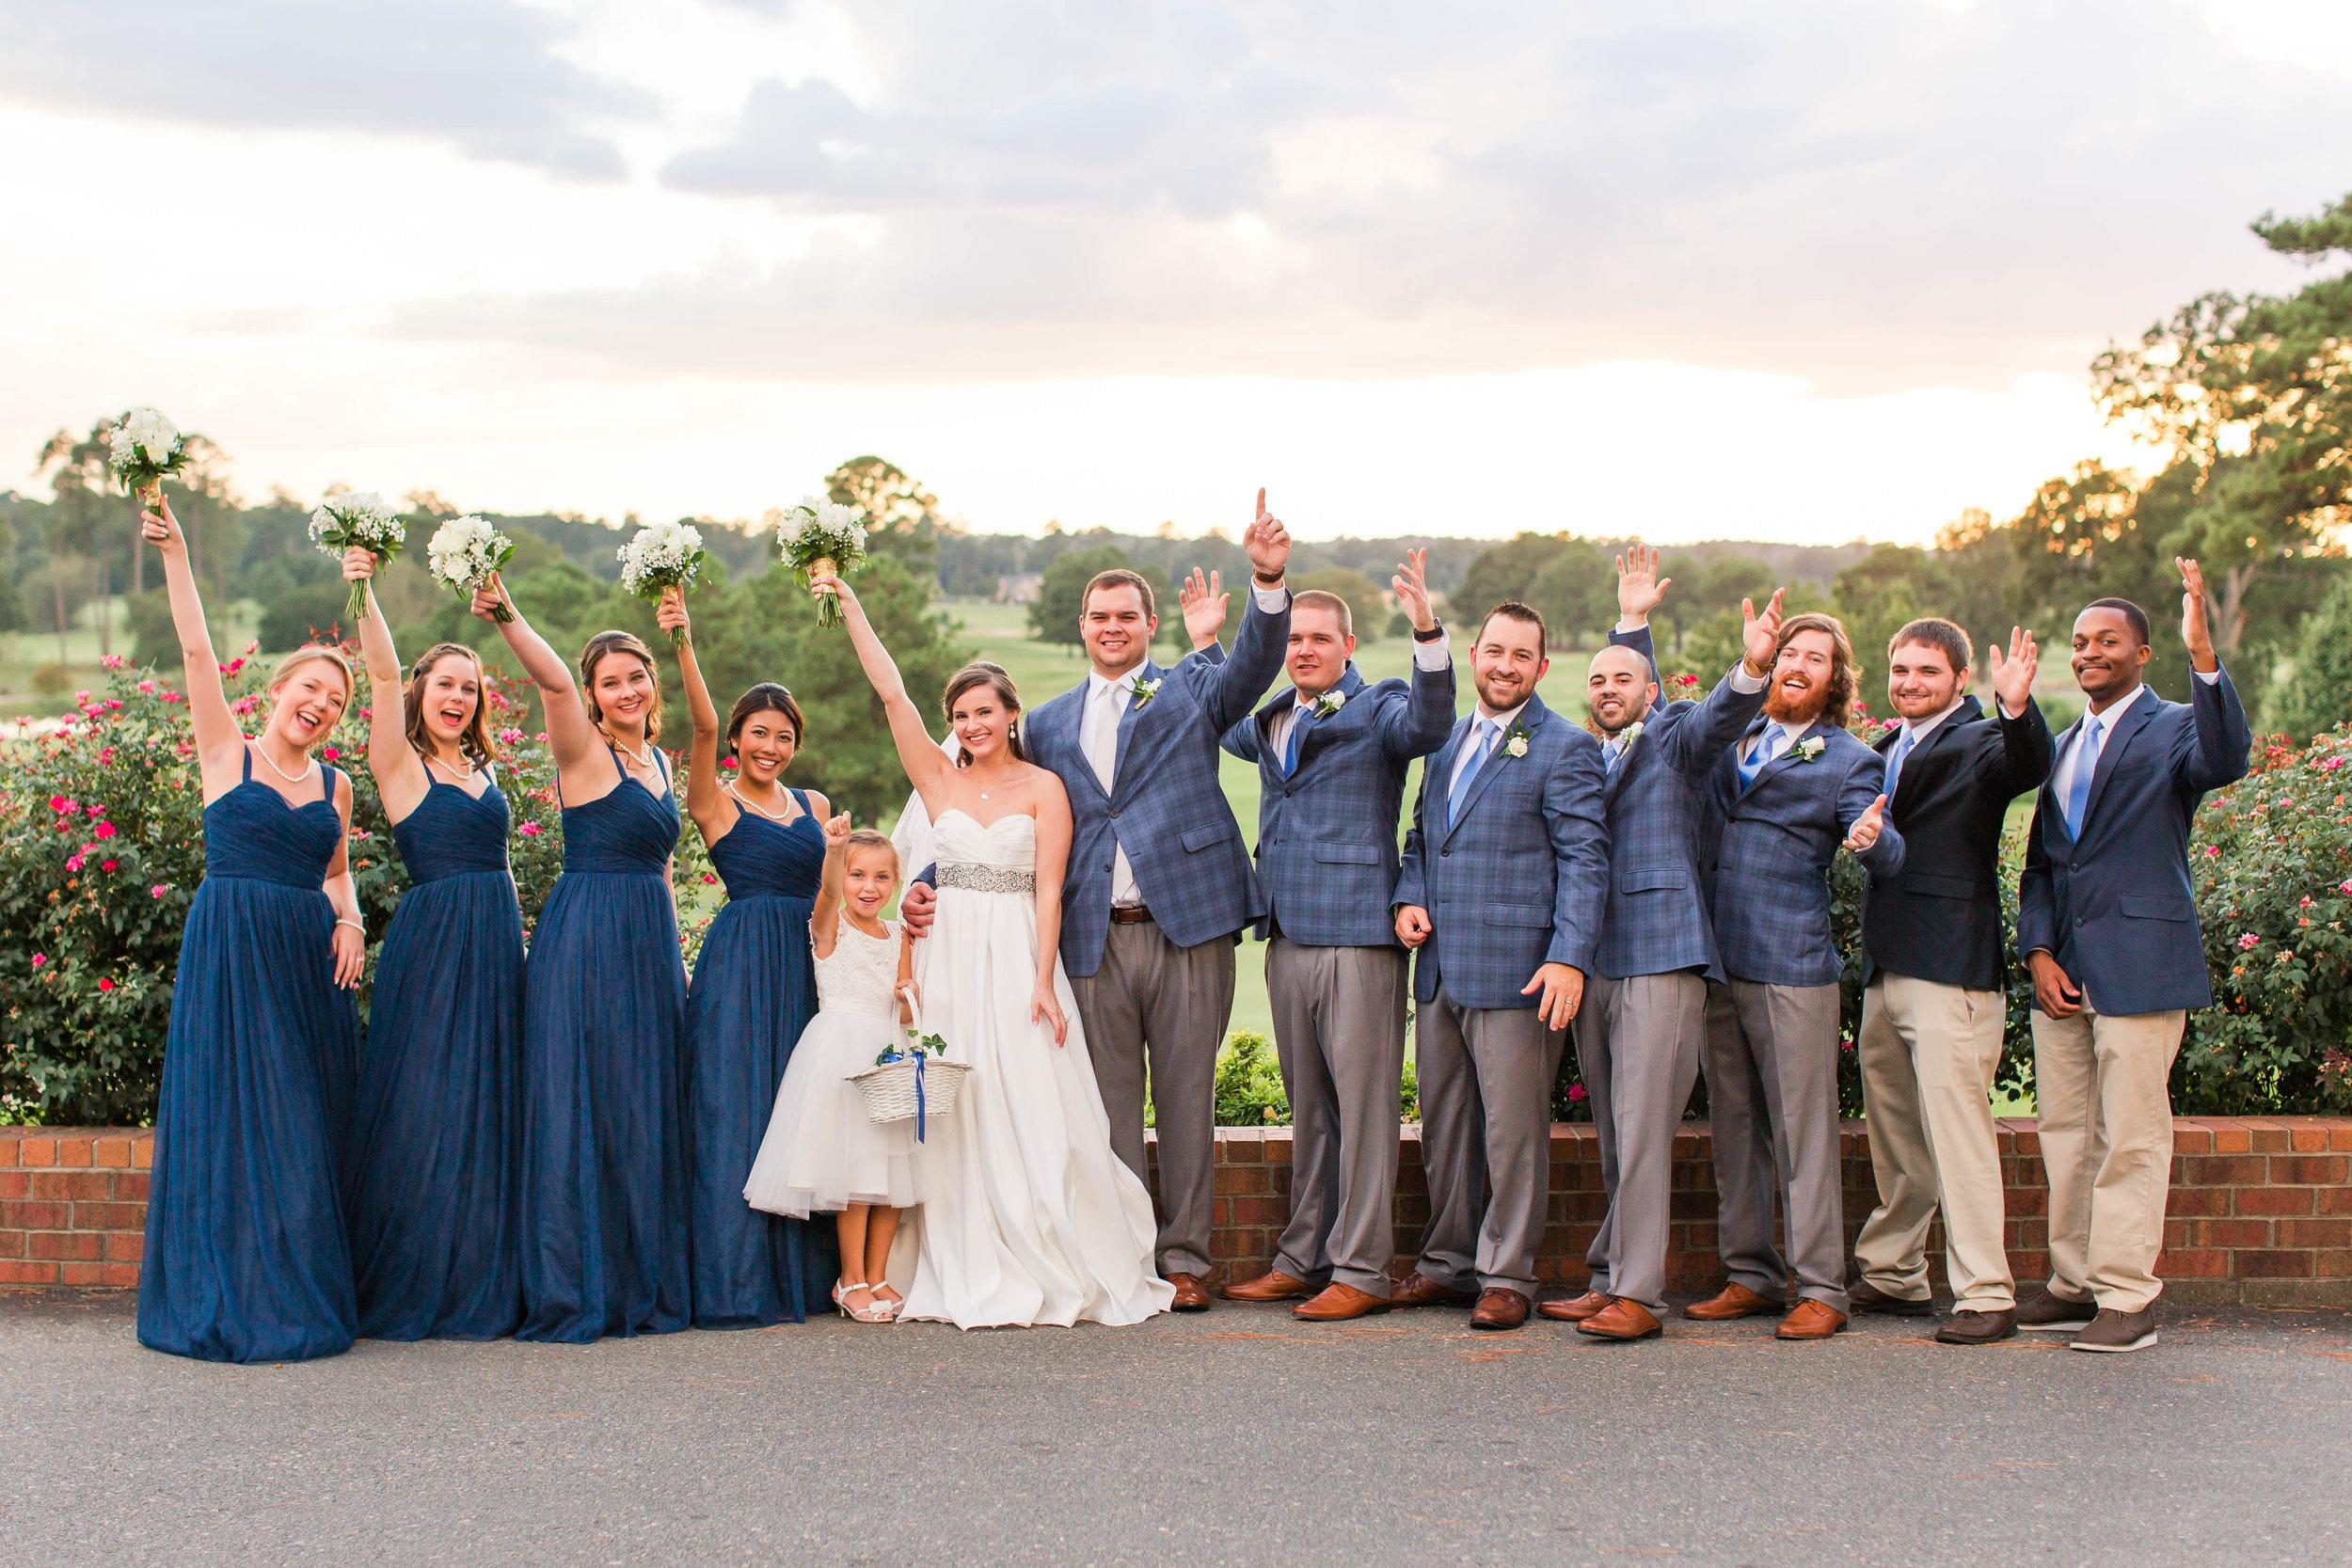 Hollomans_Family and Bridal Party_111.jpg